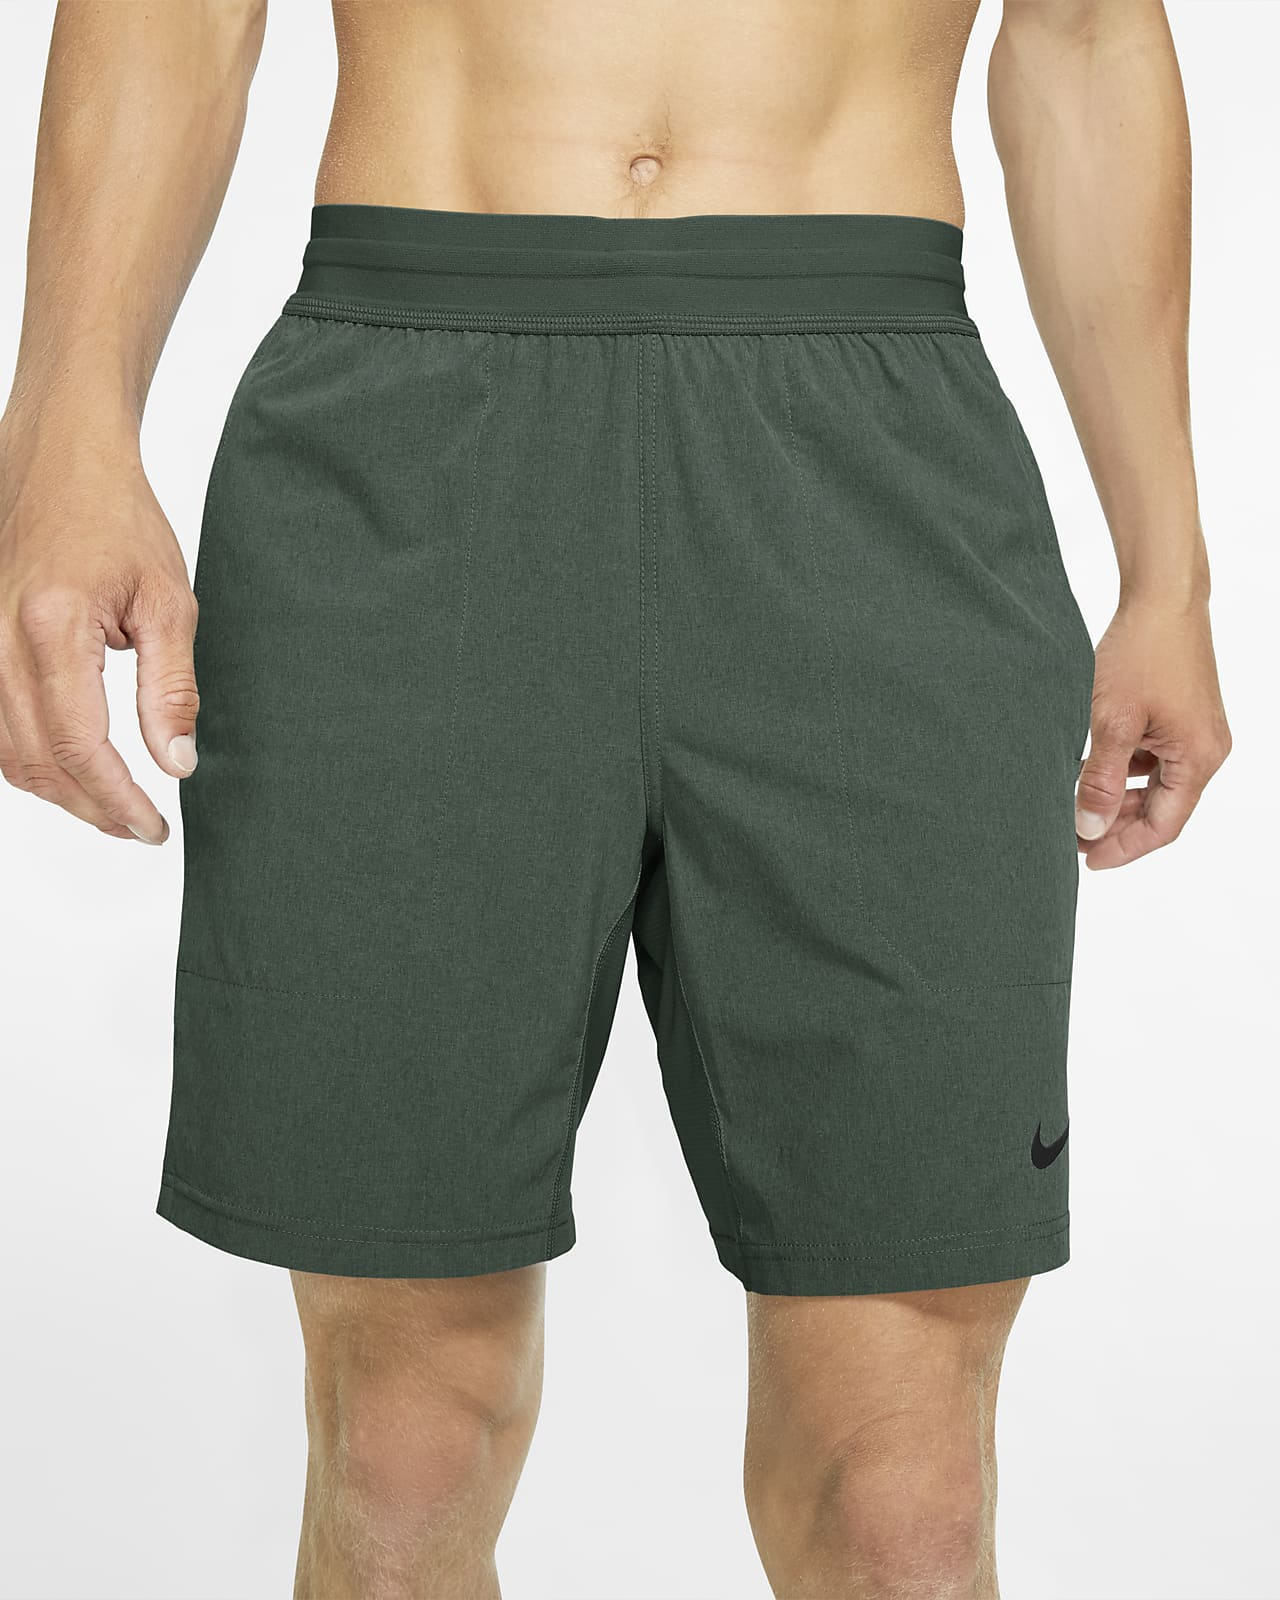 Shorts da training Nike Flex - Uomo